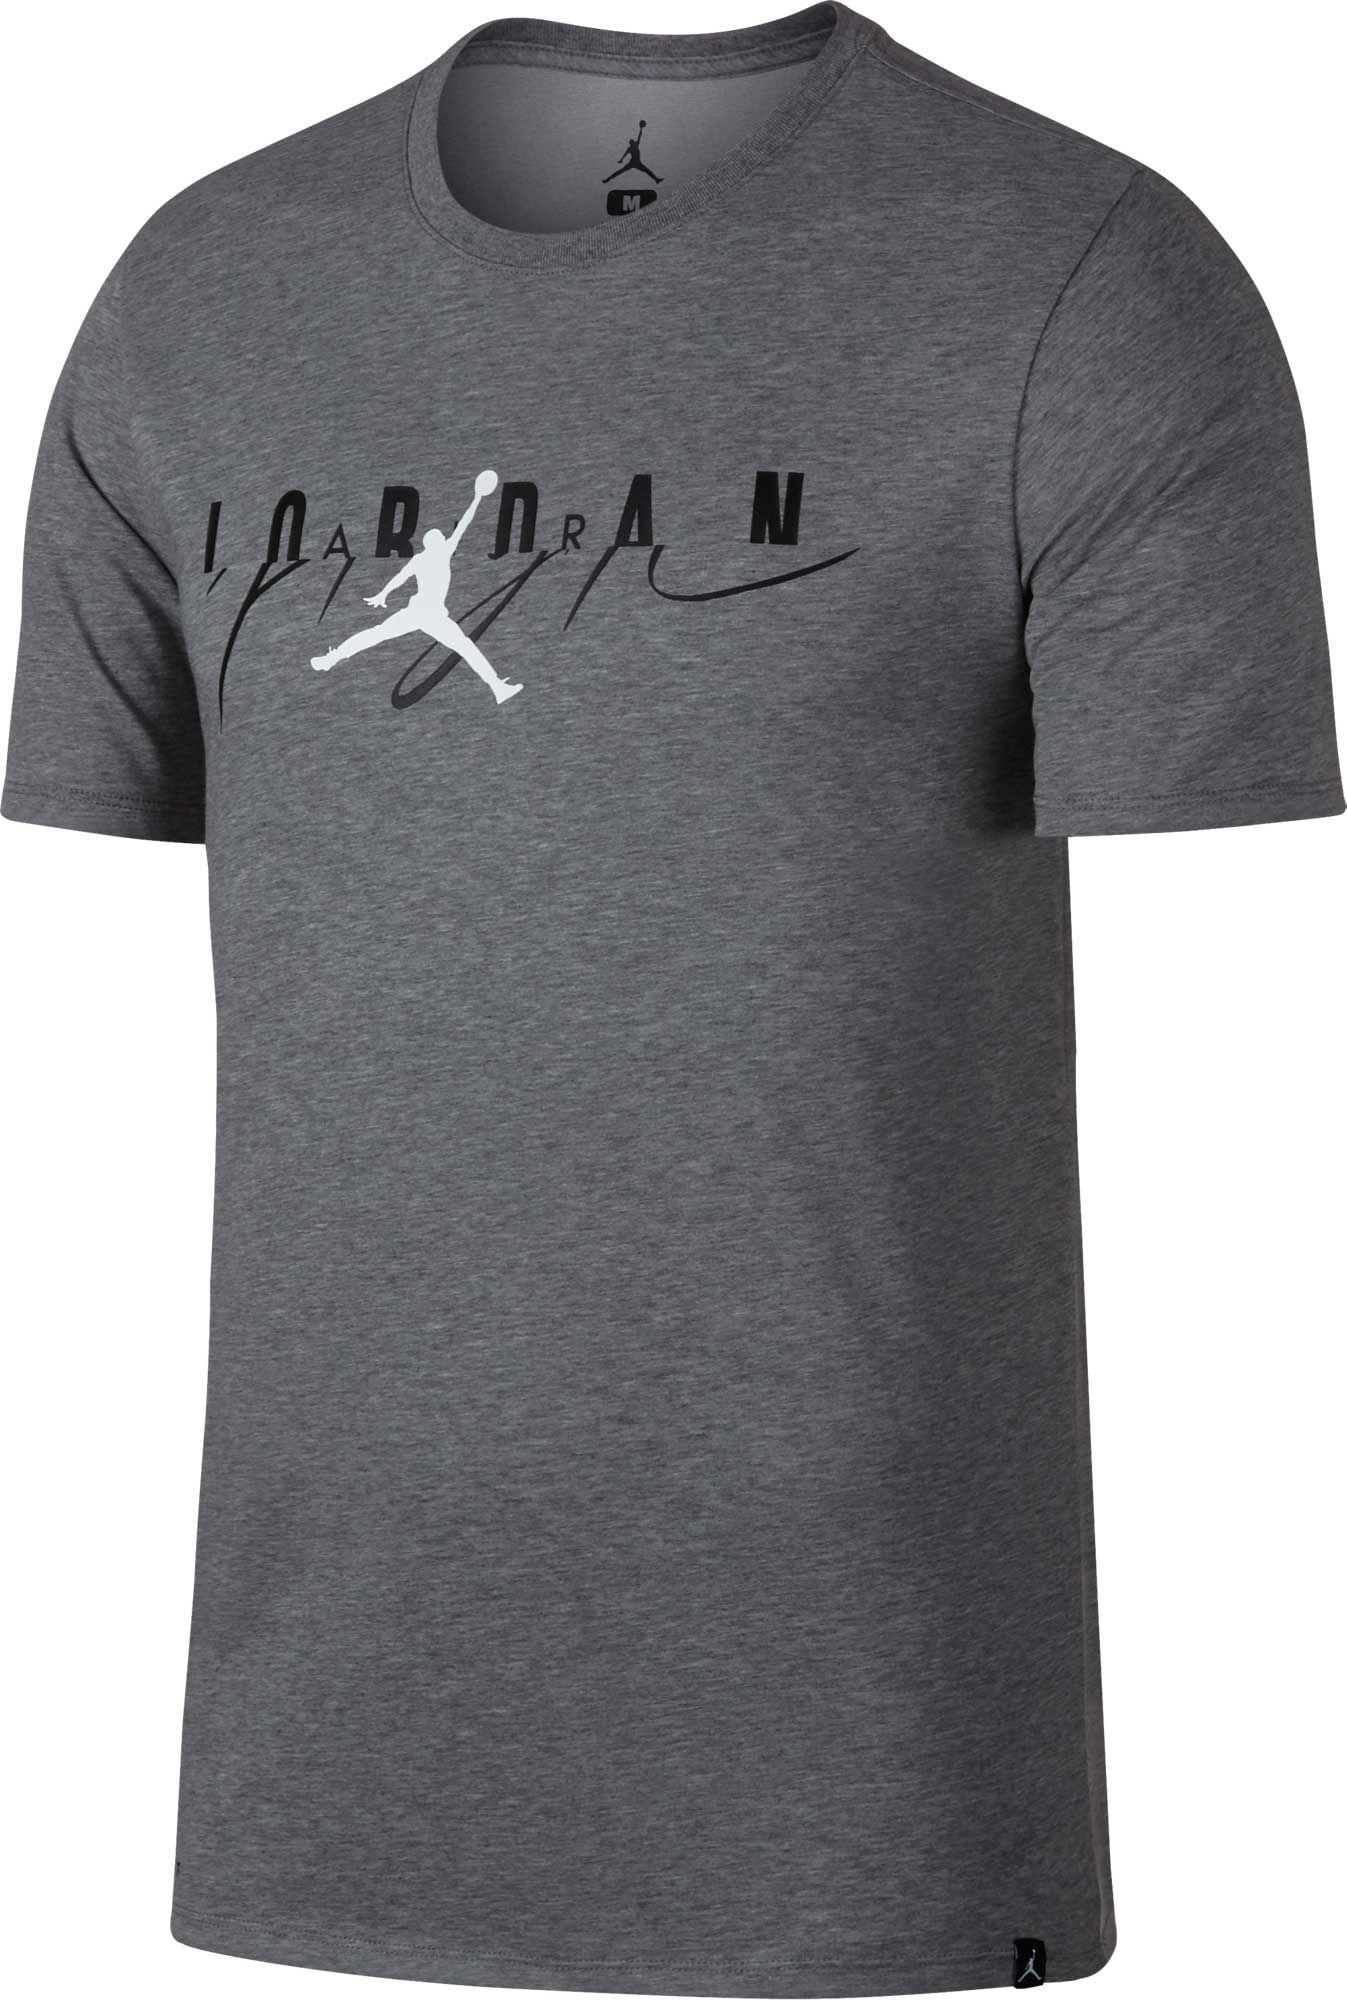 9840cee951b963 Lyst - Nike Jordan Flight Mashup Graphic Tee in Gray for Men